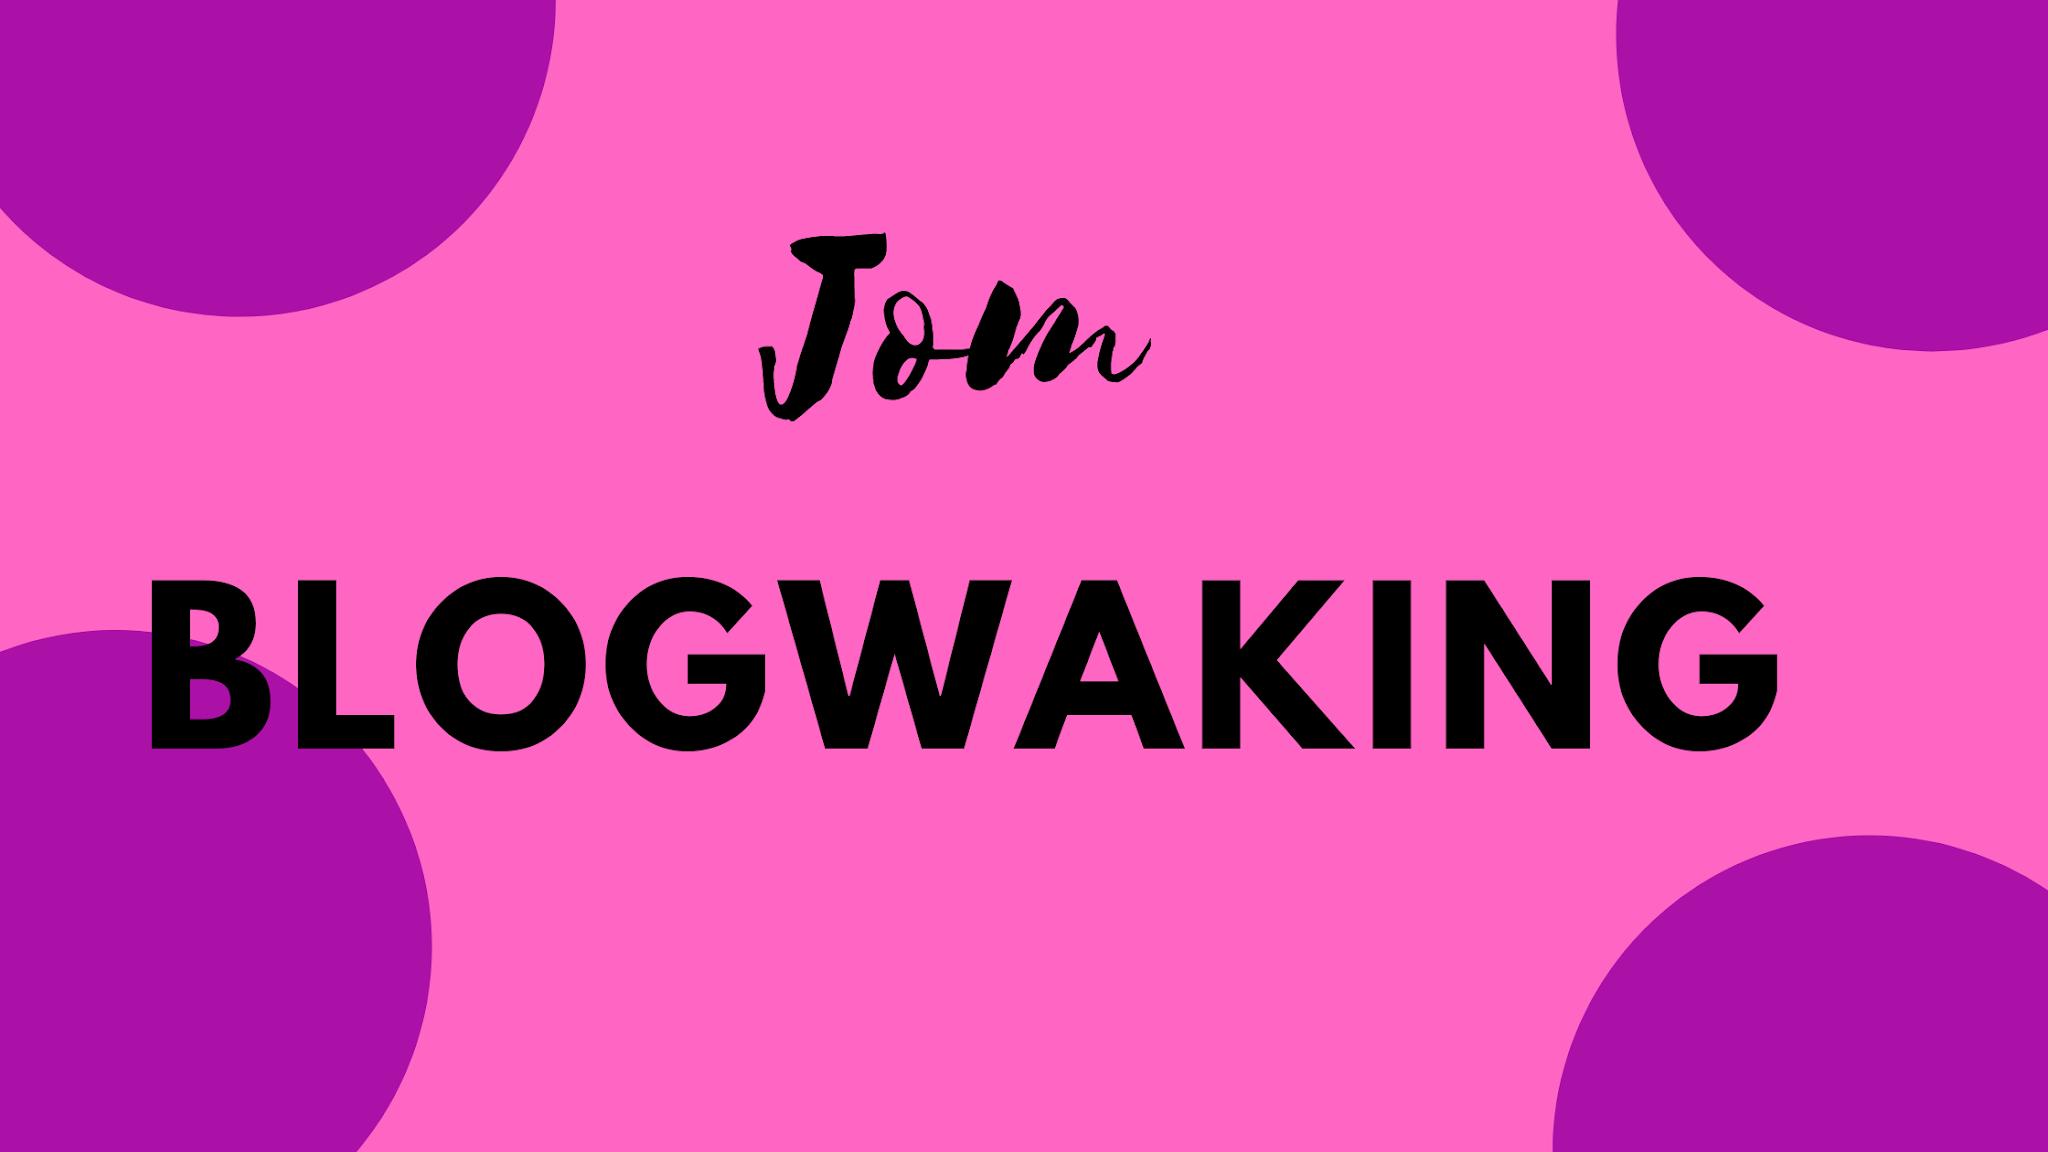 Blogwaking